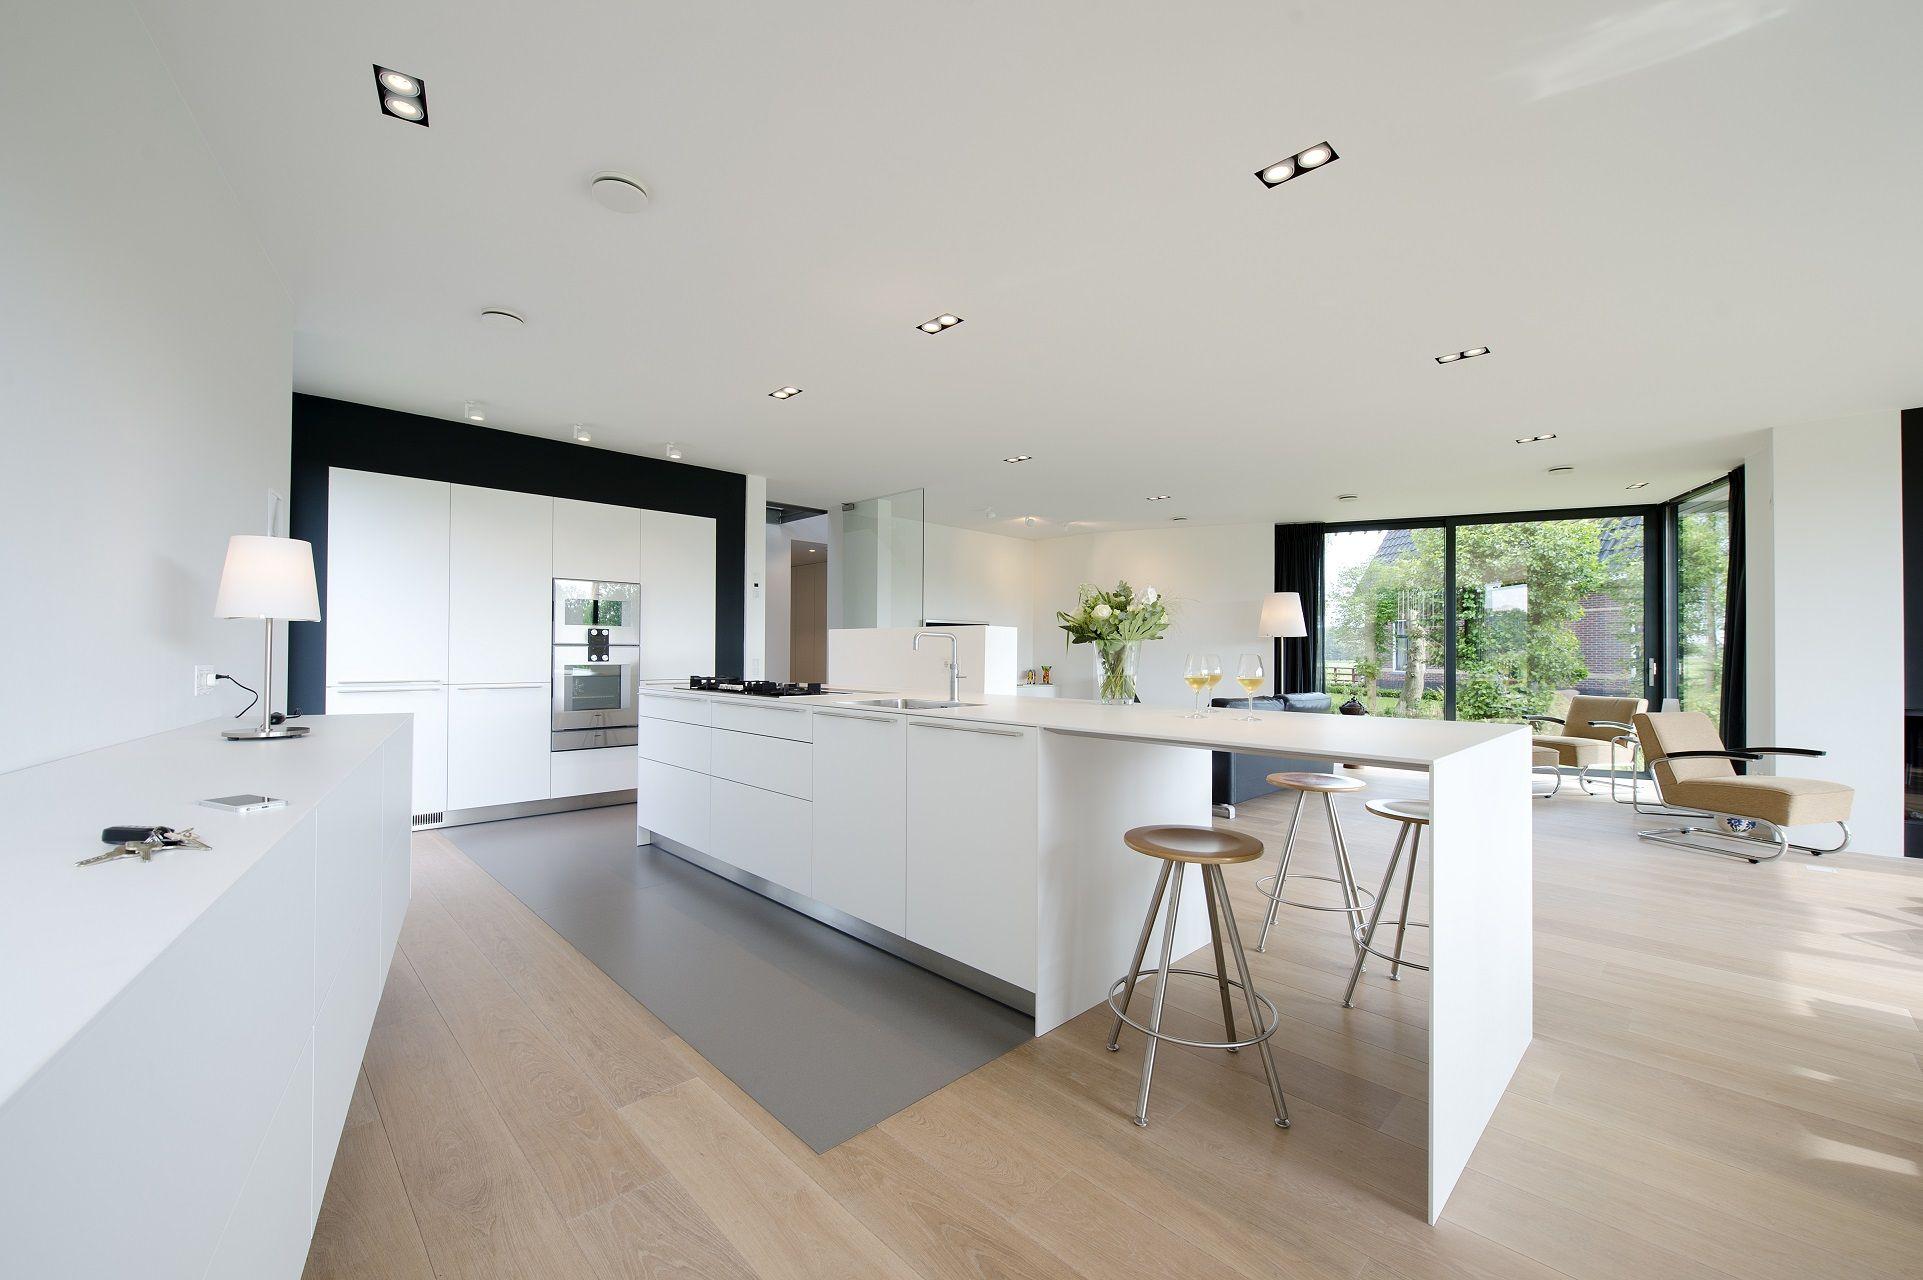 bulthaupt k che interior pinterest bulthaupt k chen k che und design k chen. Black Bedroom Furniture Sets. Home Design Ideas